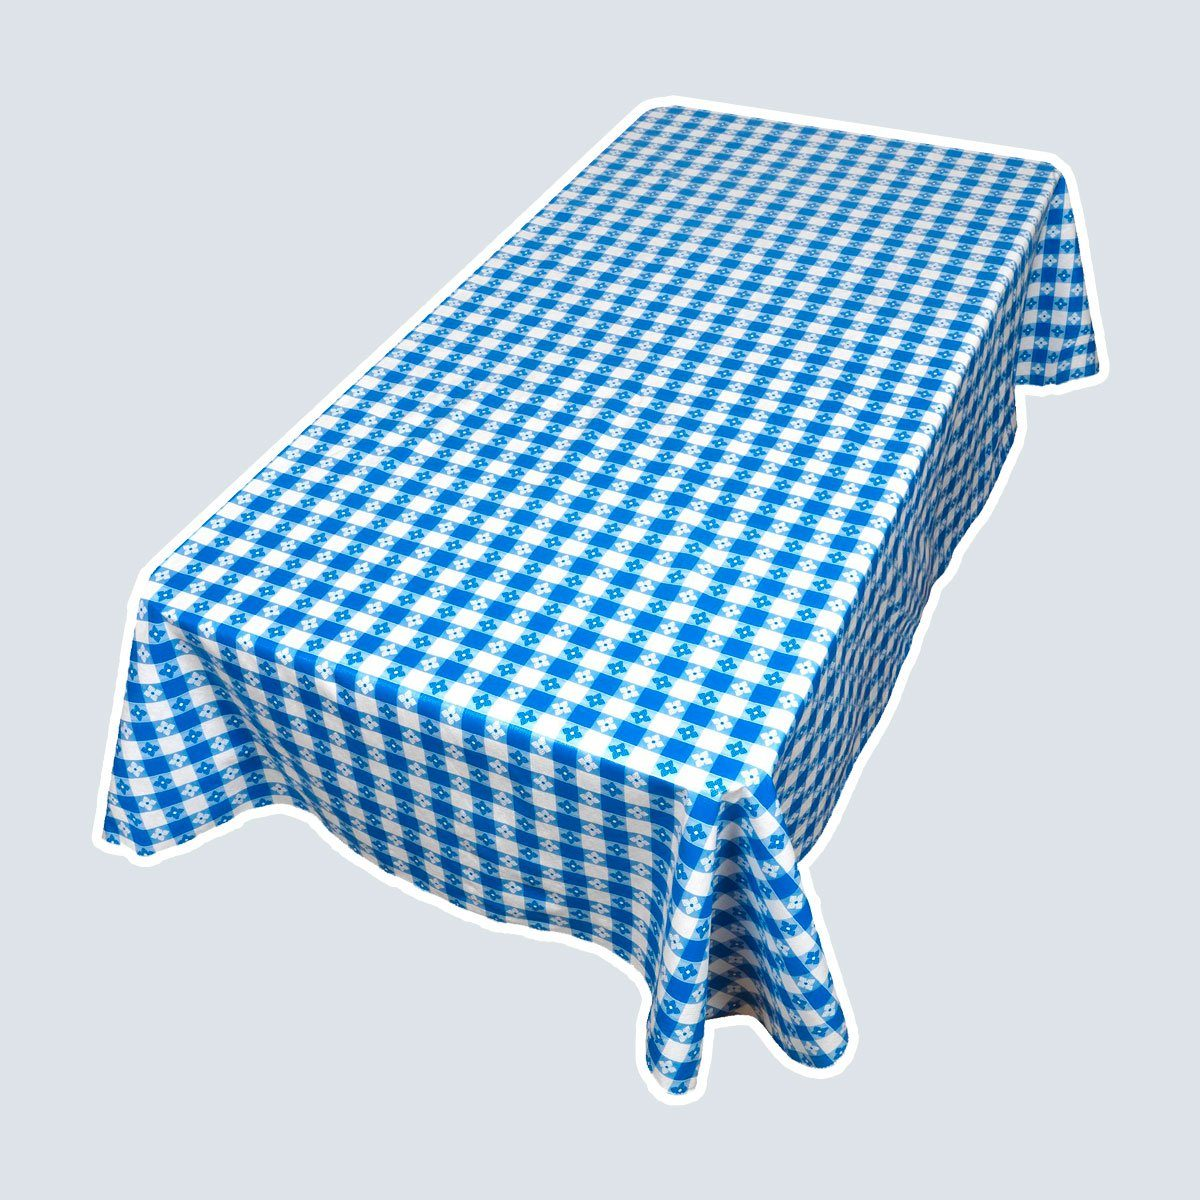 Picnic Check Blue Tablecloth